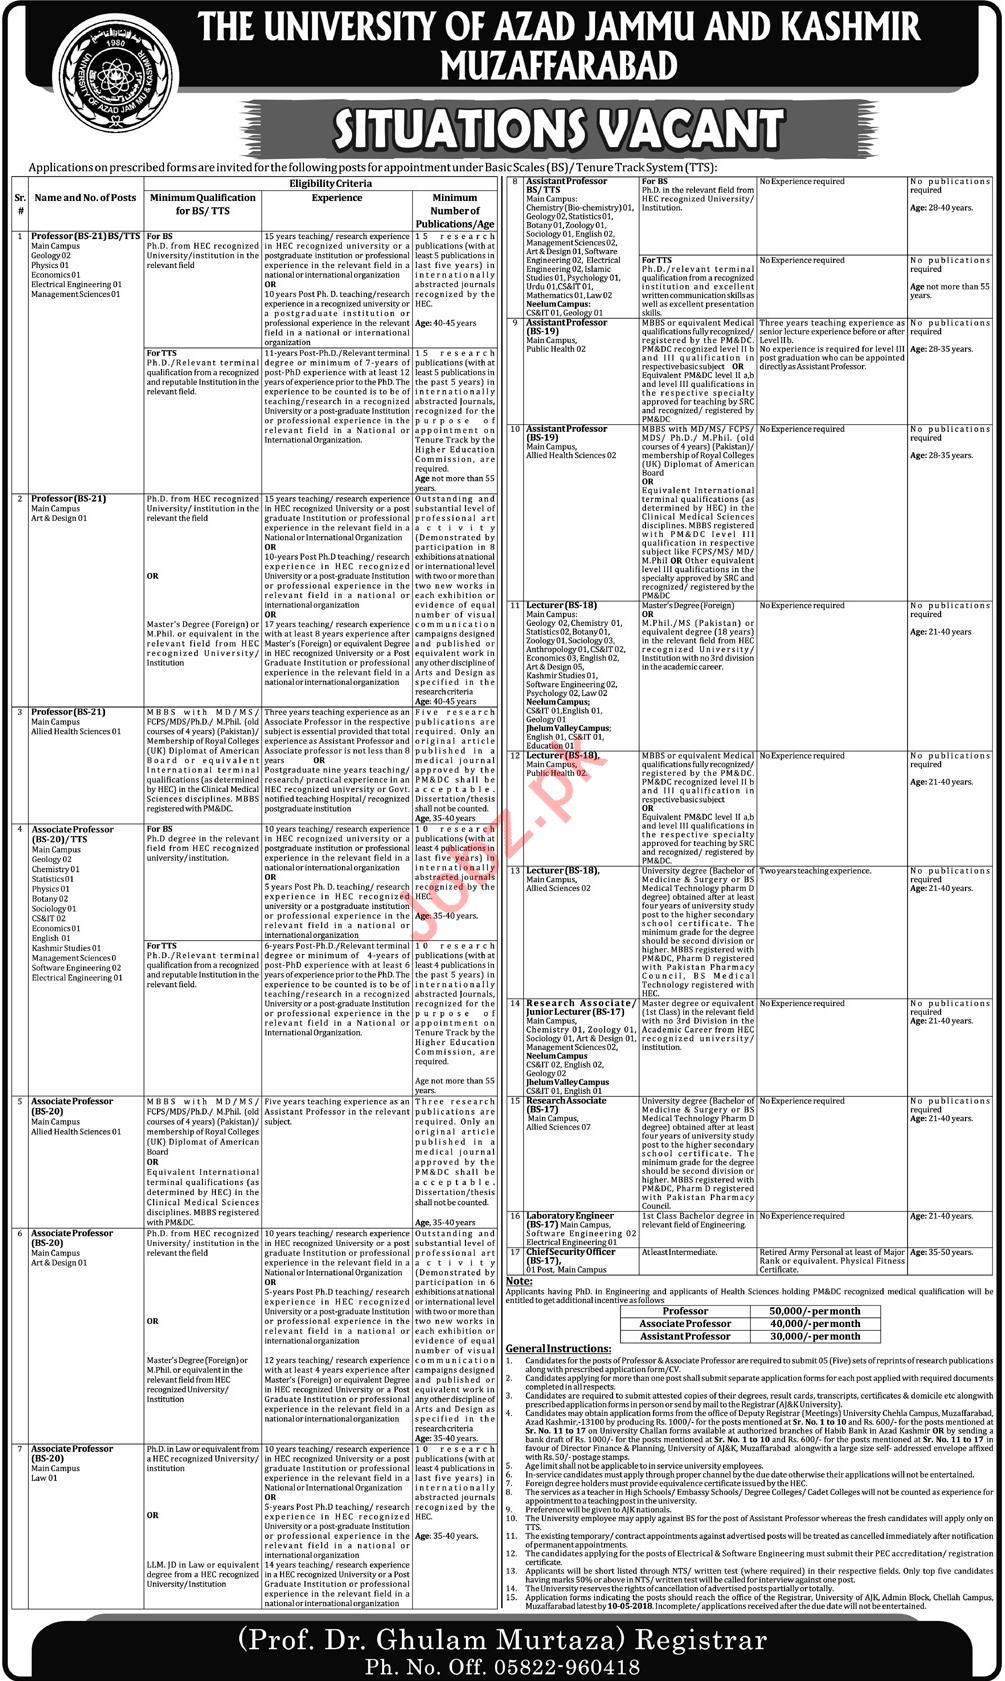 University of Azad Jammu & Kashmir Jobs 2018 for Professors